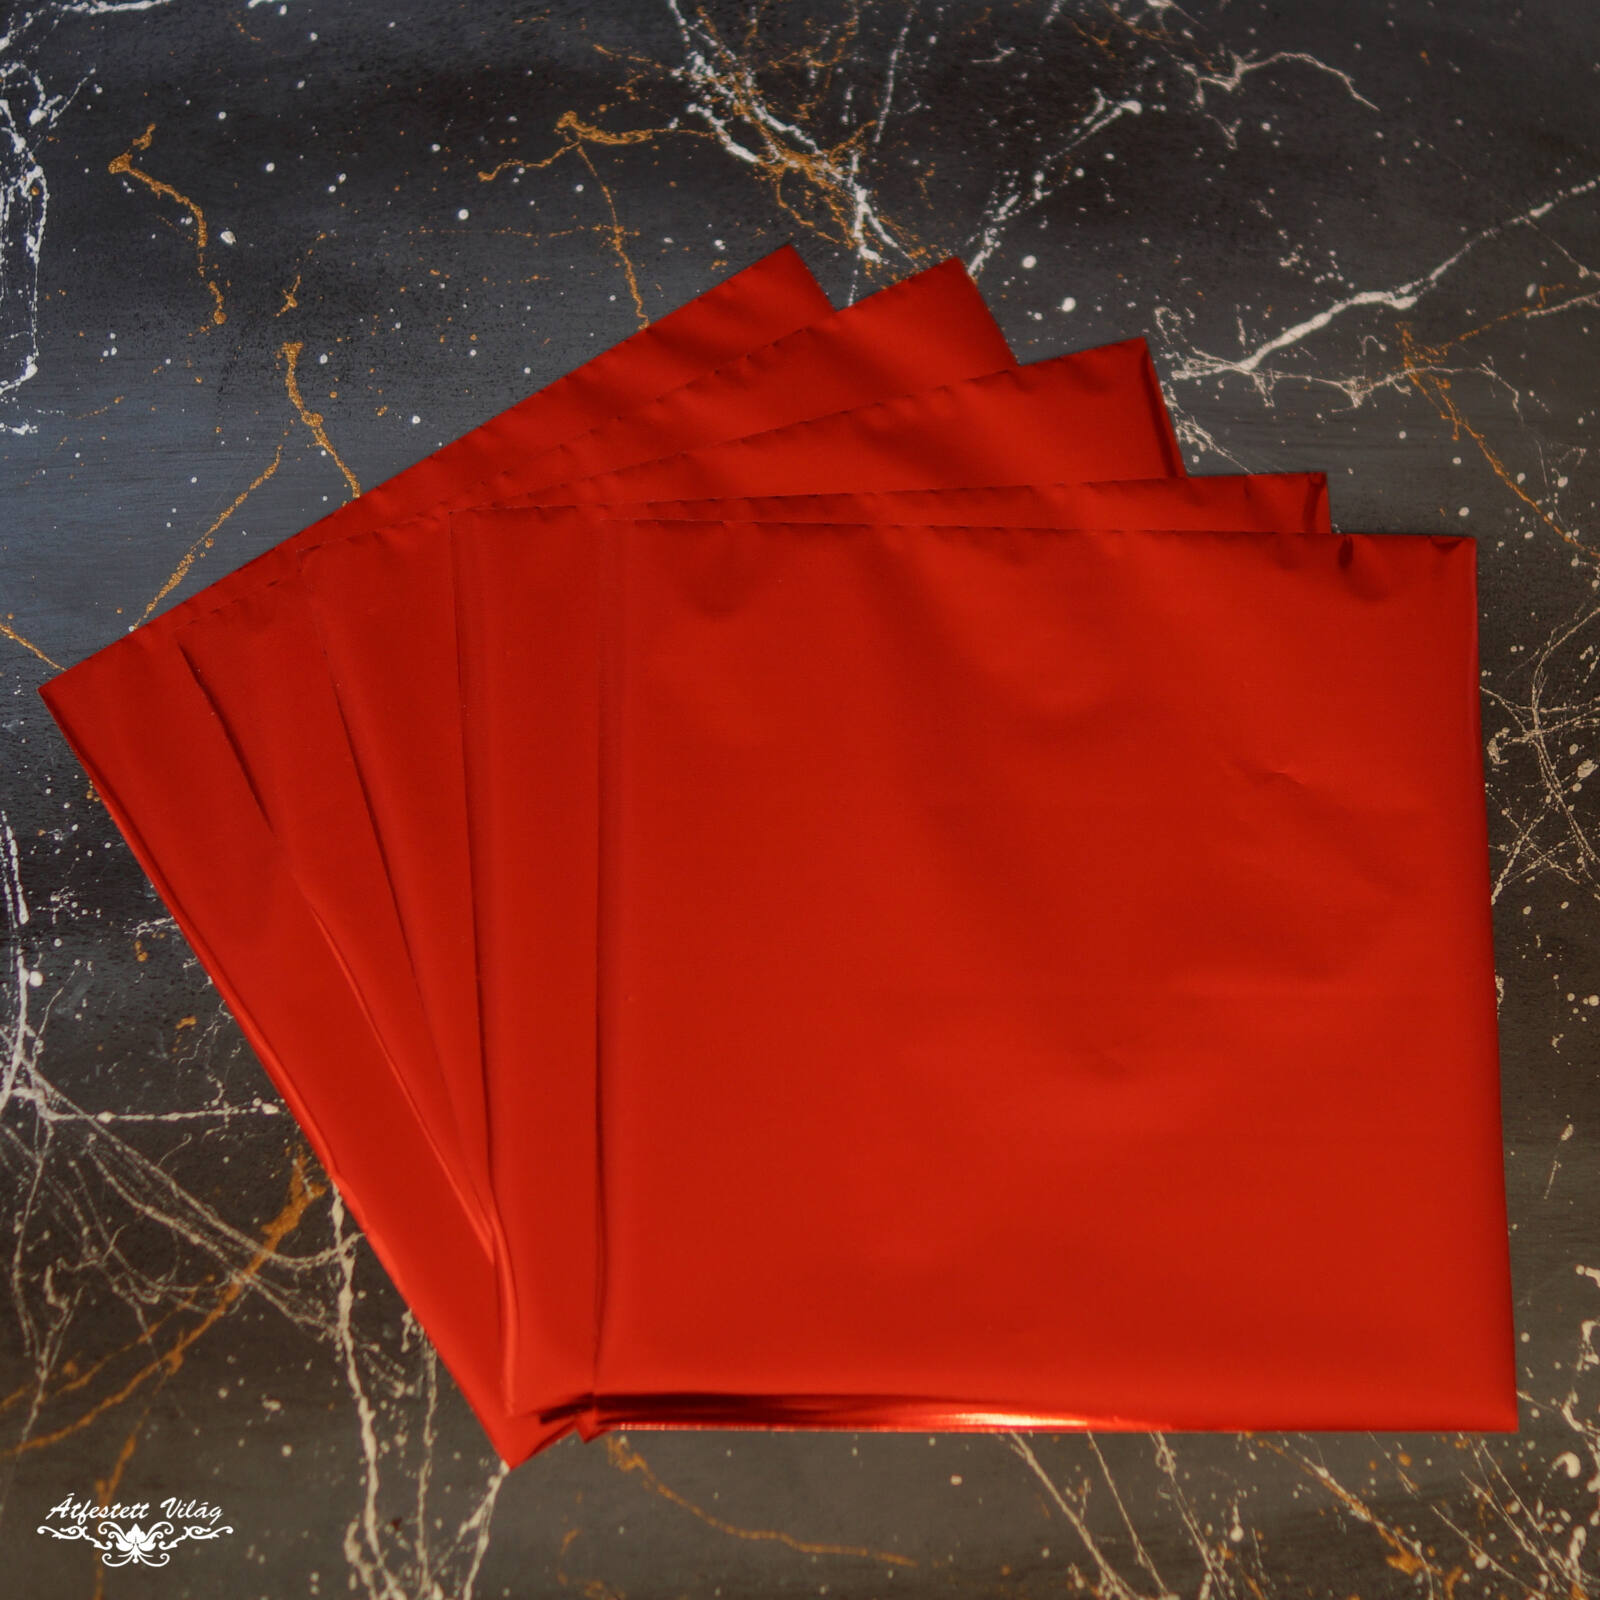 Füstfólia lap 1 darab [Piros]